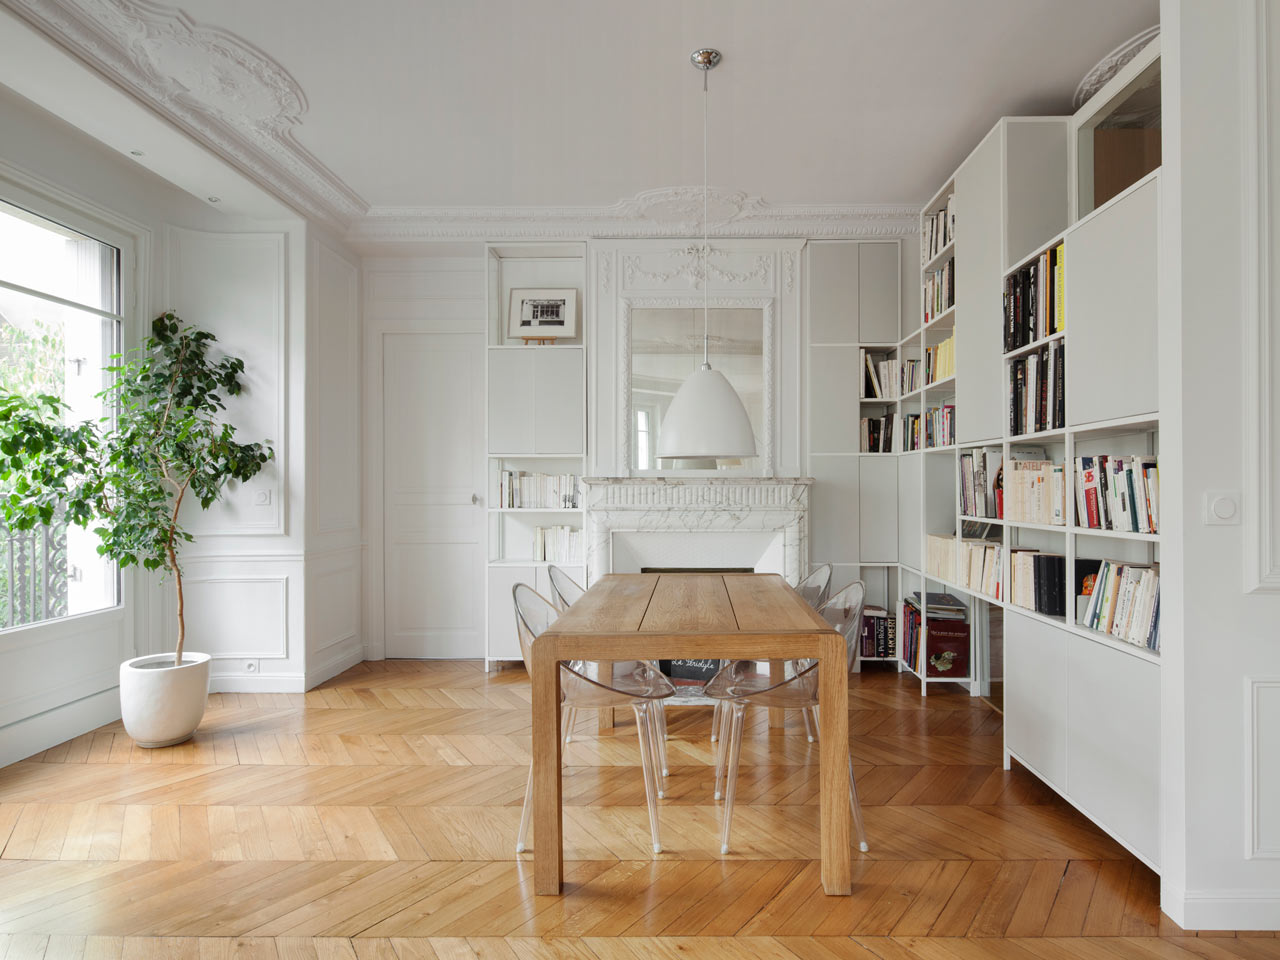 A modern haussmannien flat in the heart of paris design milk - Deco salle a manger ancienne ...